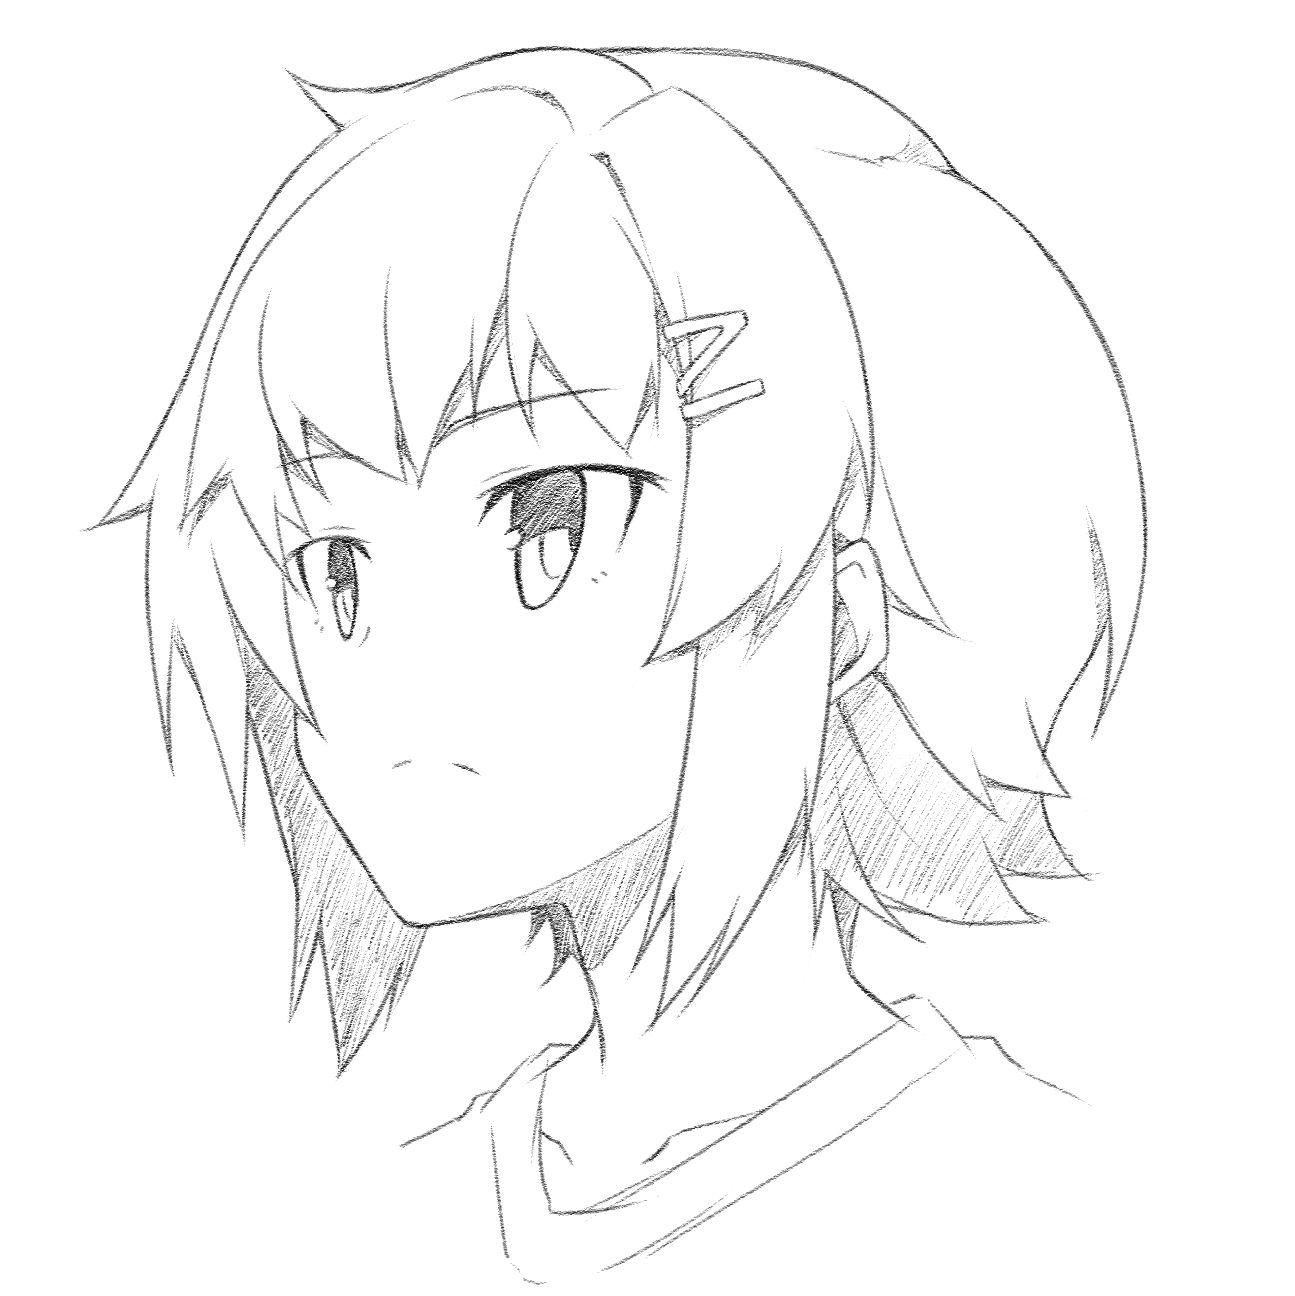 How To Draw Anime Back View Google Search Desenho Desenhos Anime